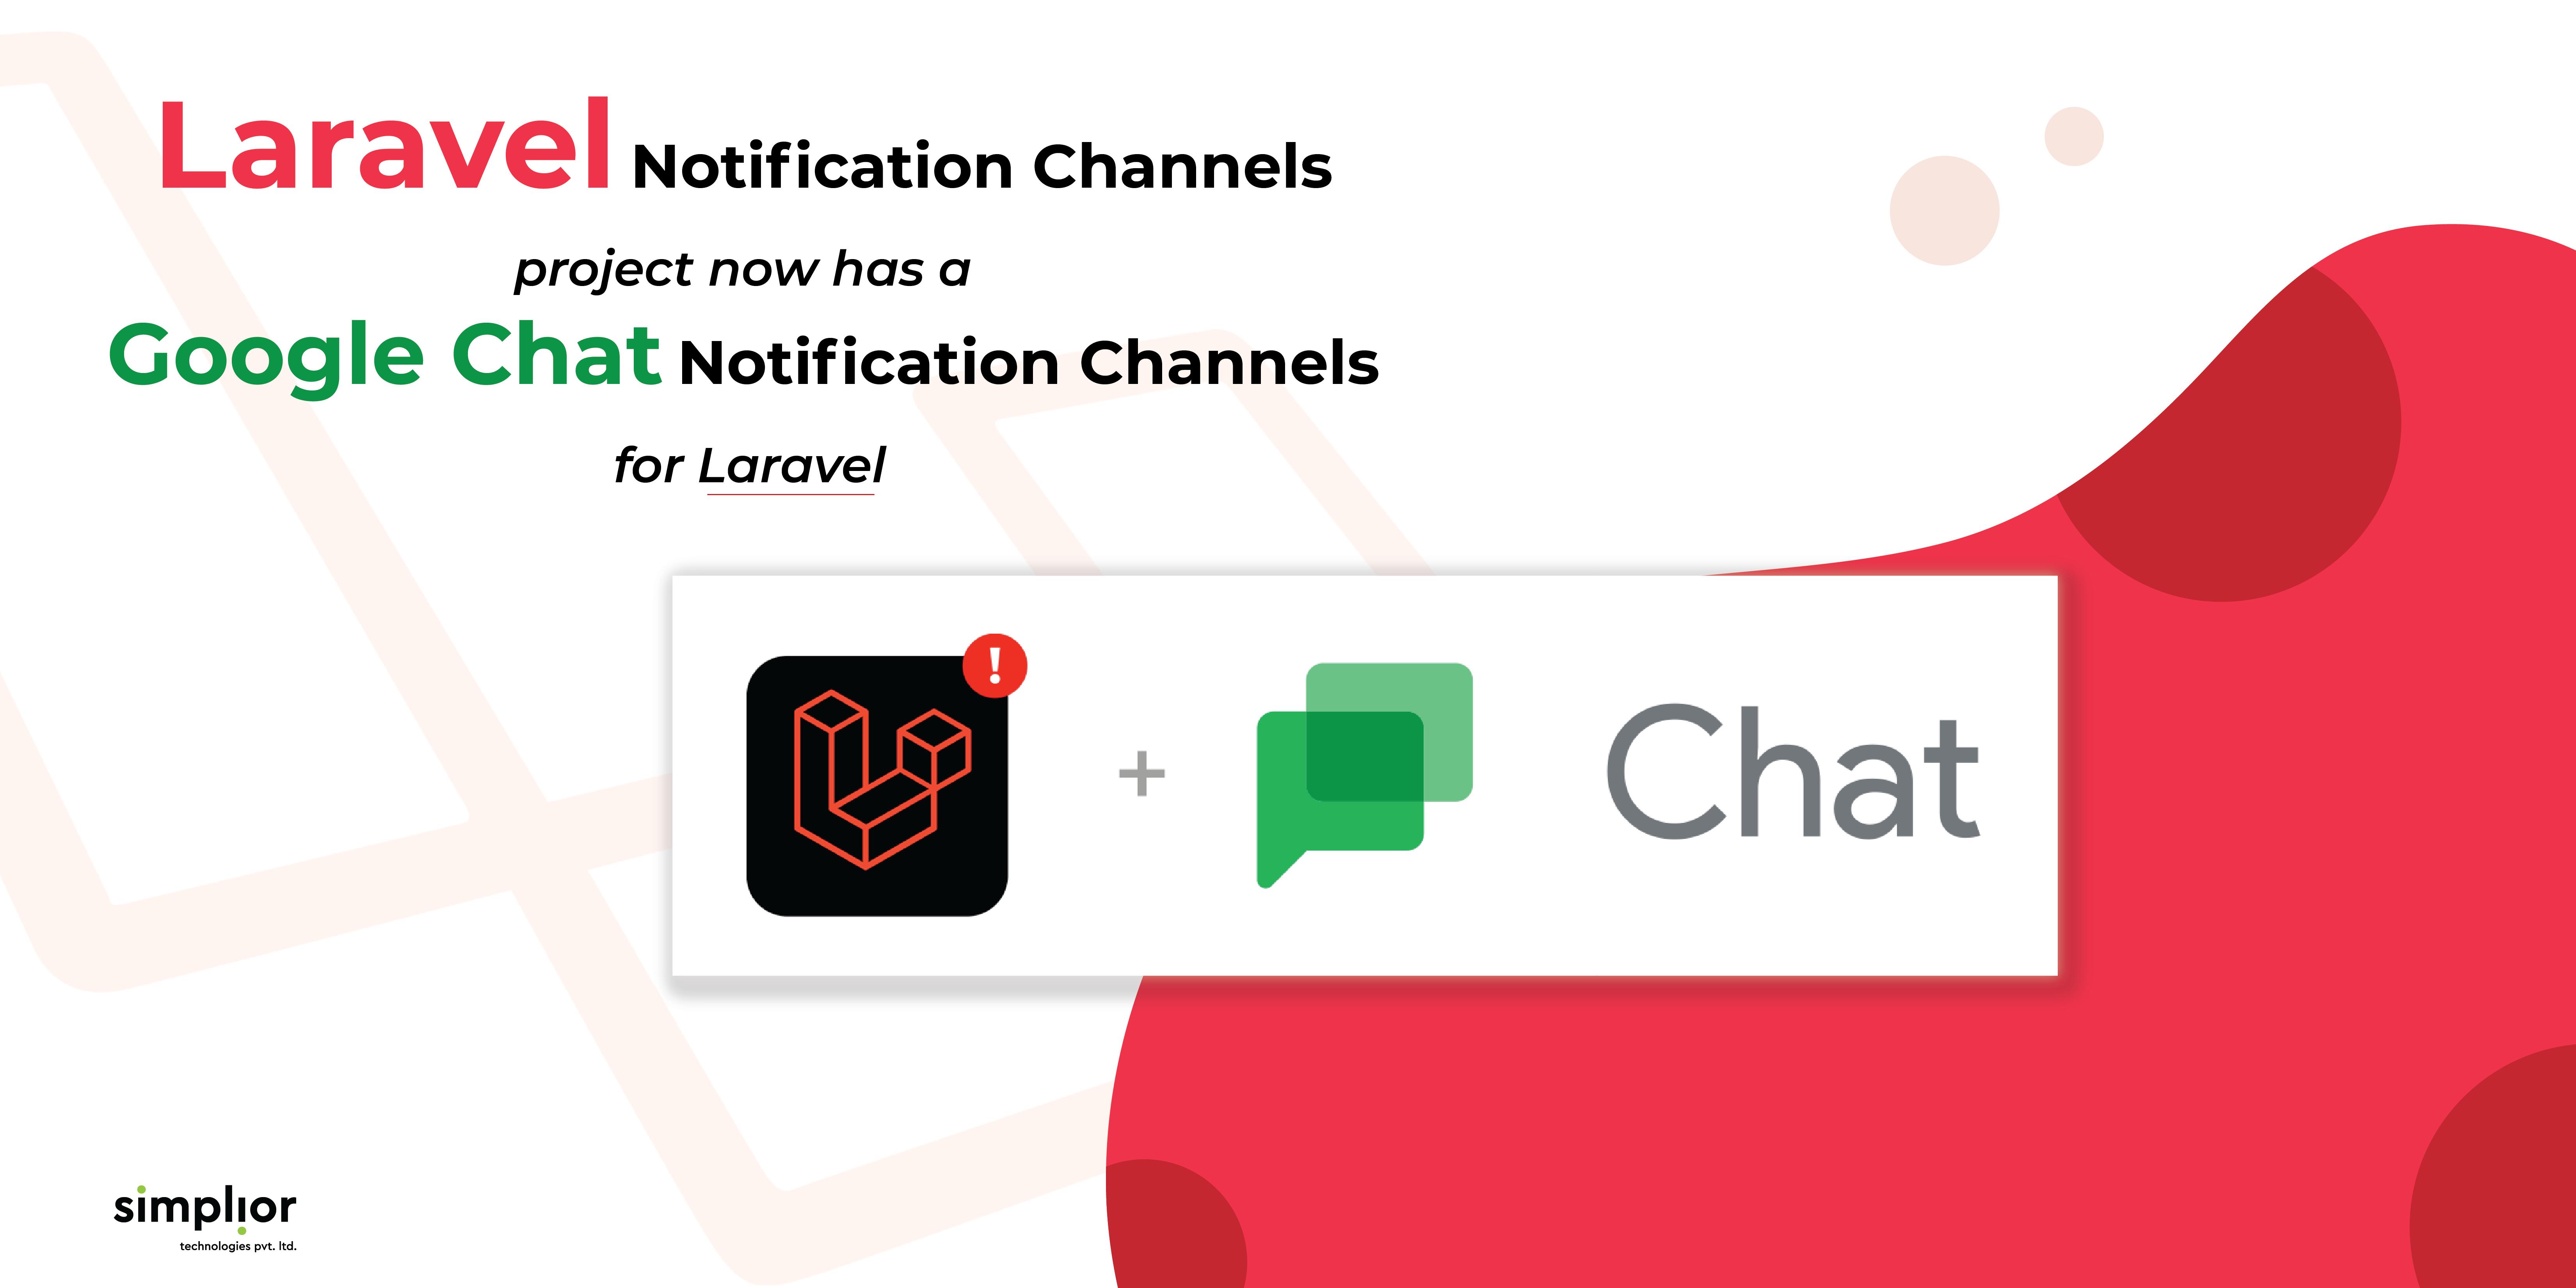 Laravel-Google Chat-Simplior